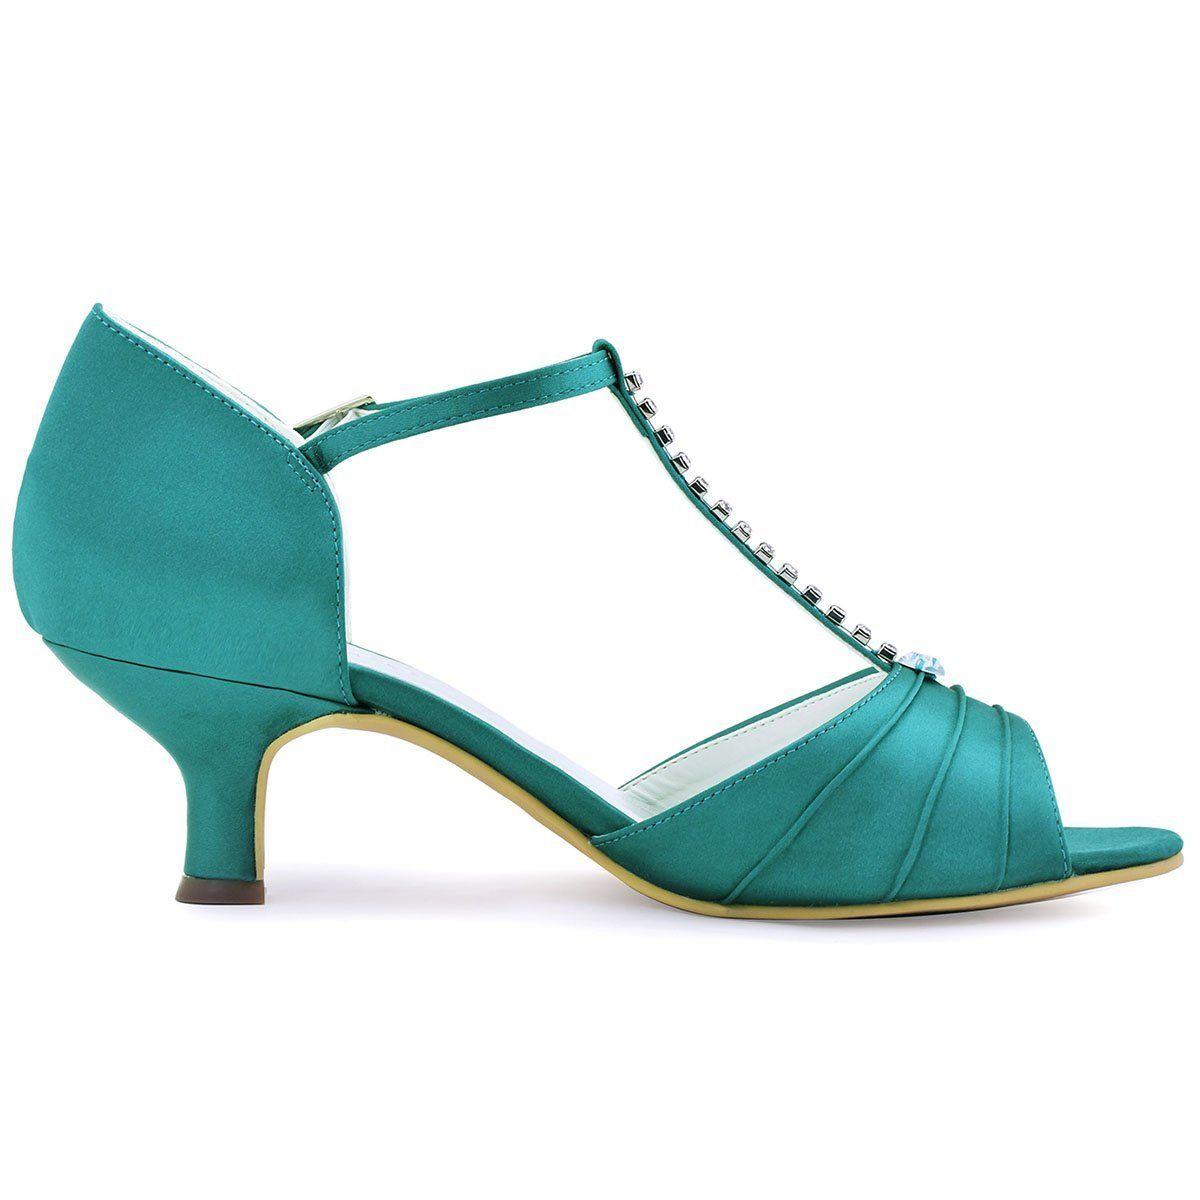 47++ Satin low wedding heels ideas in 2021